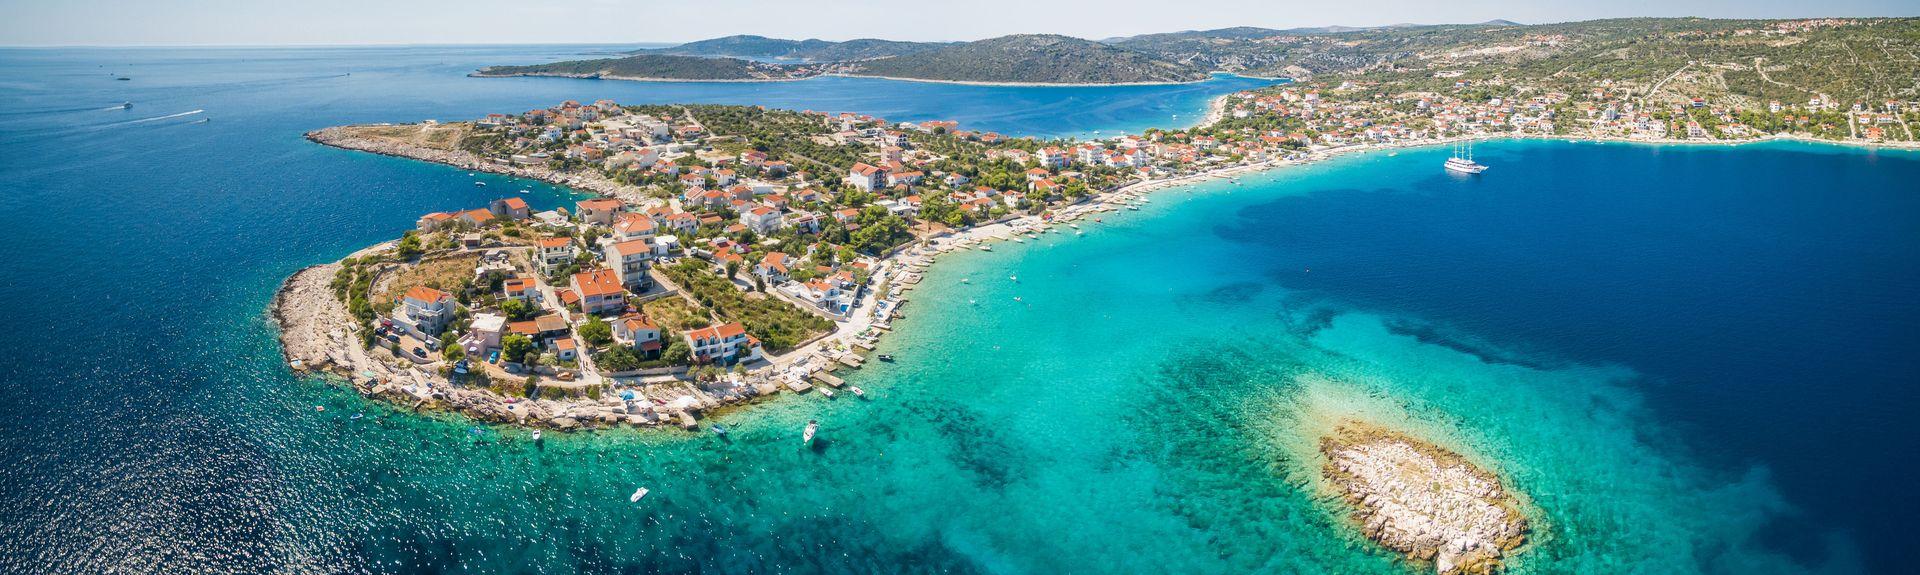 Primosten-stranden, Primosten, Šibenik-Knin, Kroatia